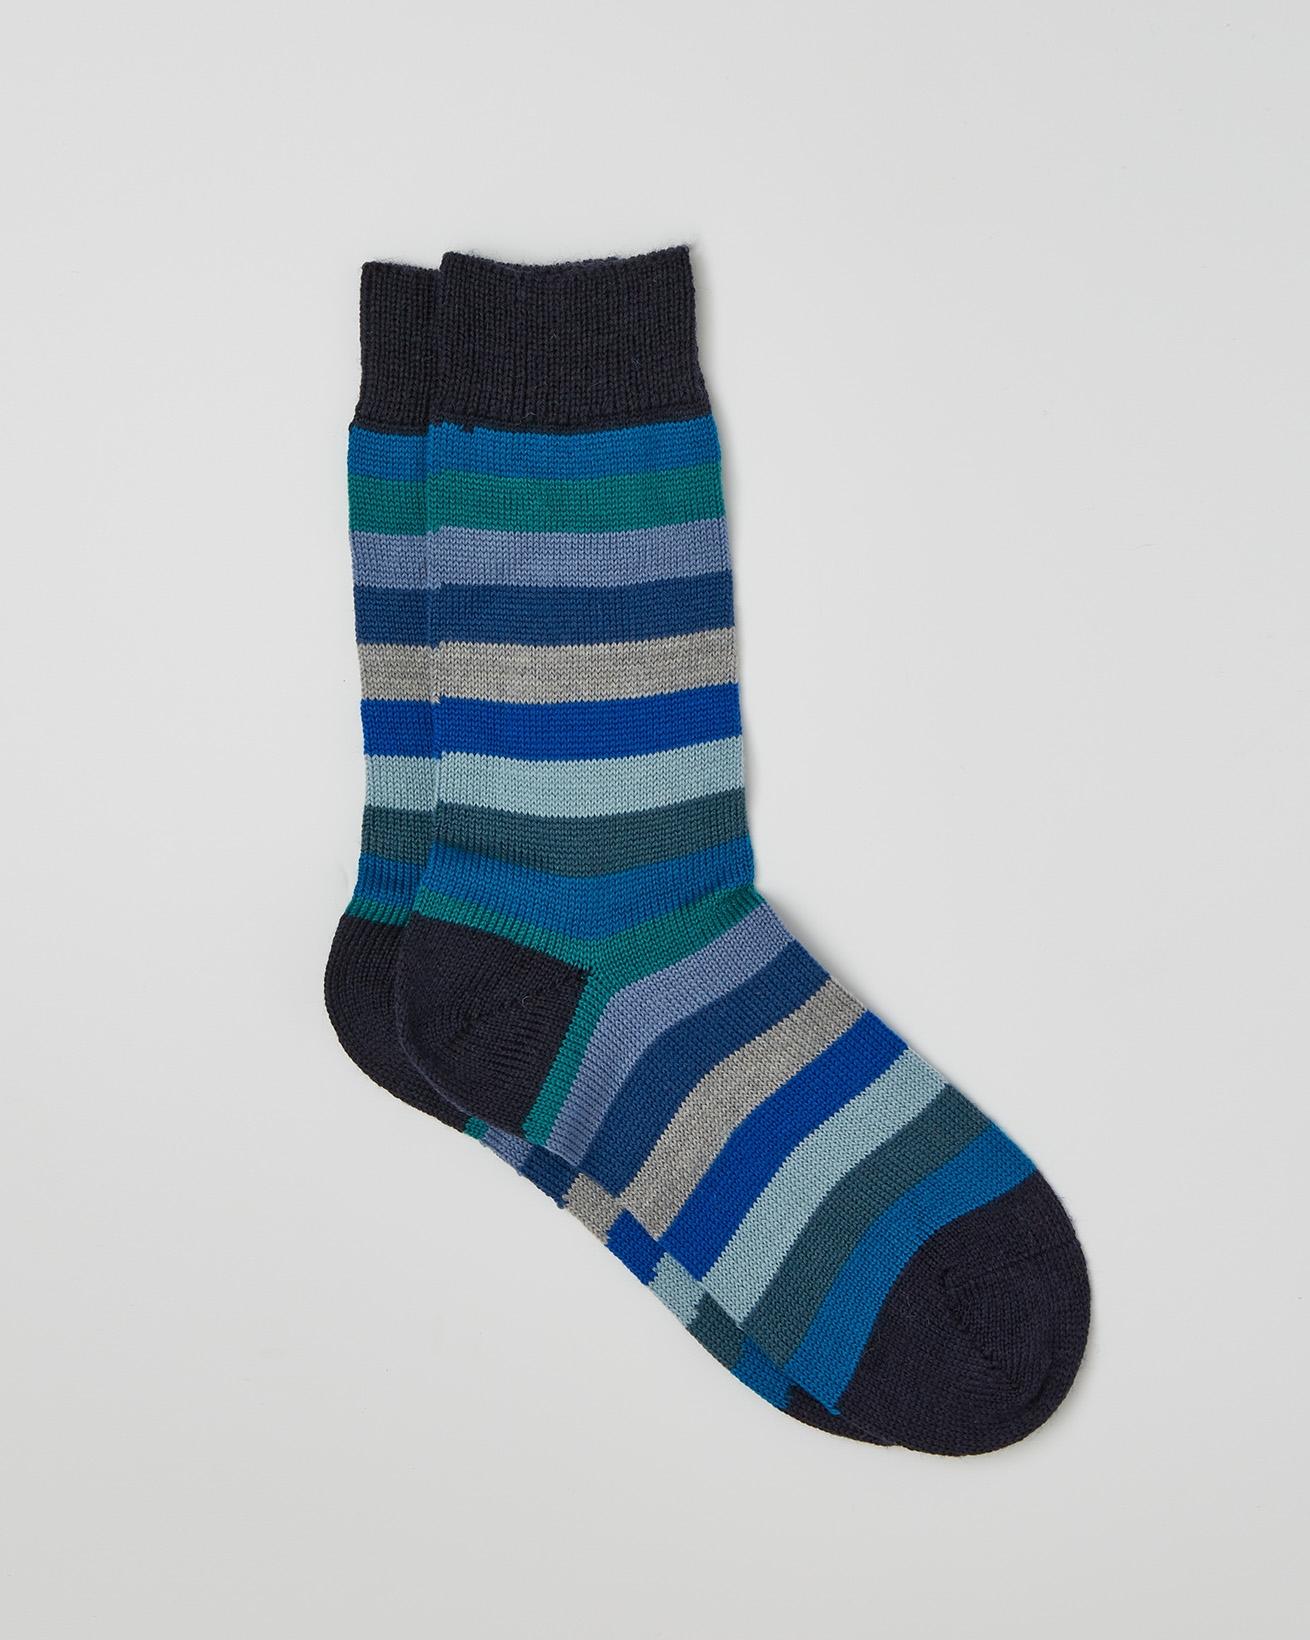 LADIES MERINO STRIPEY SOCKS - BLUE MIX - ONE SIZE - 2514